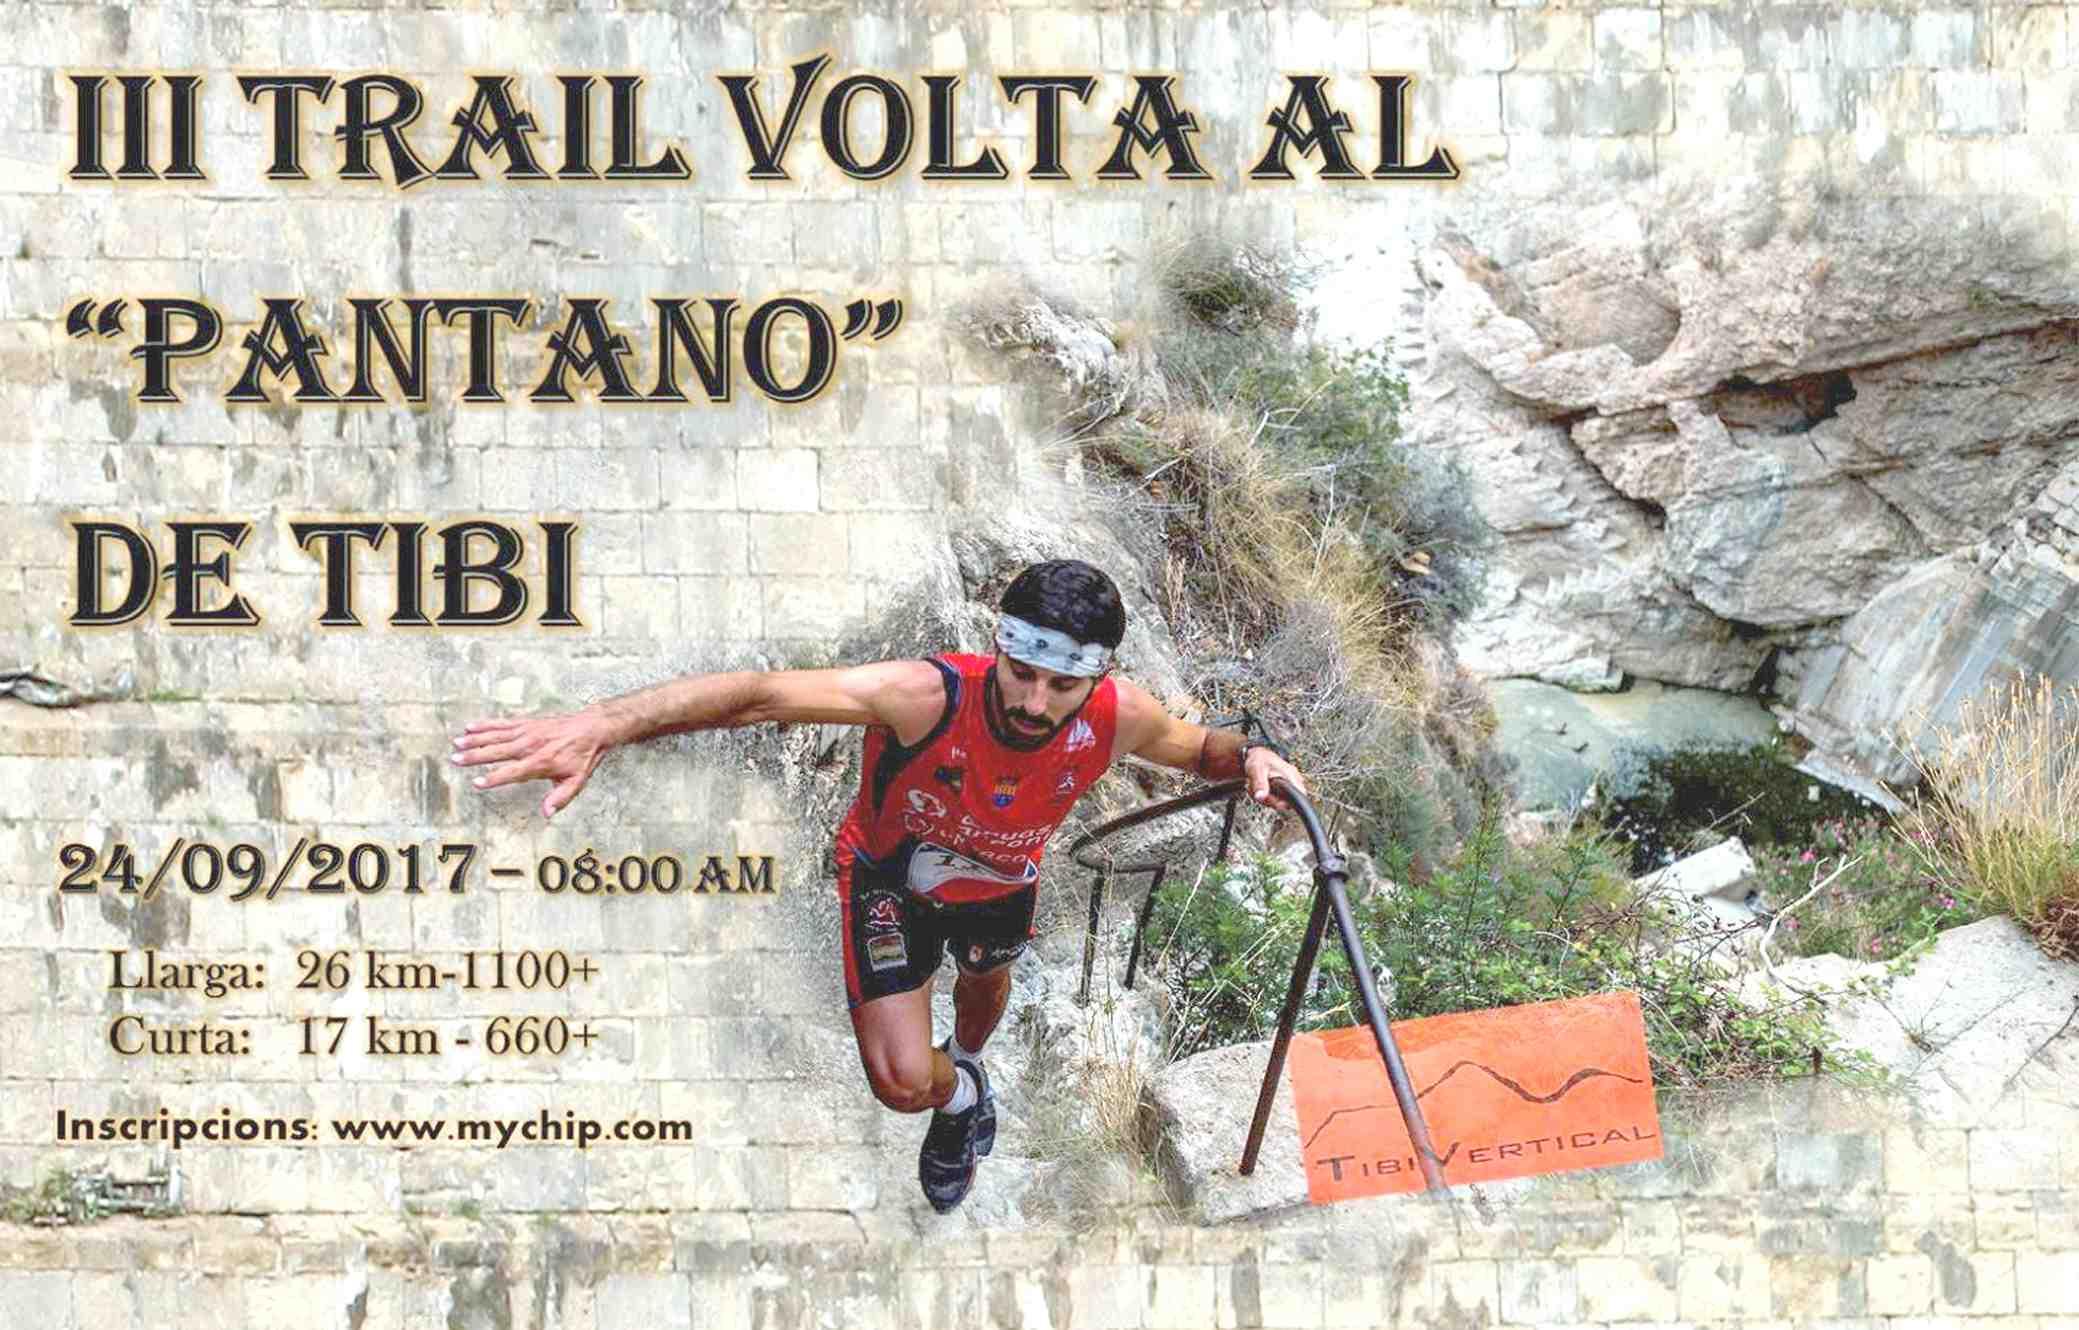 El domingo 24 de septiembre, tercera edición del Trail Volta al Pantano de Tibi